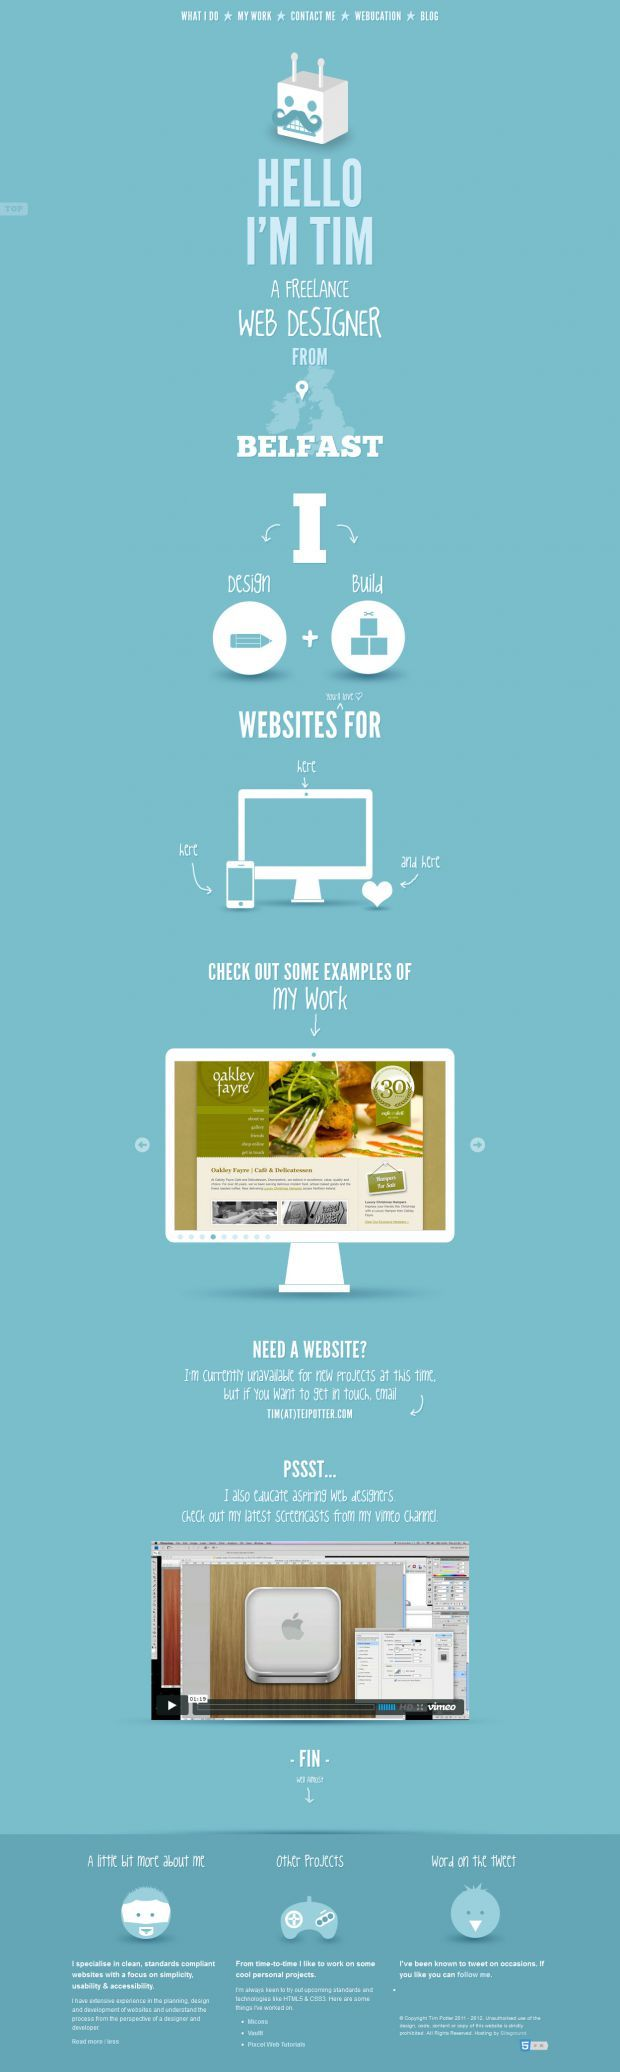 Portfolio of Tim Potter - Belfast Freelance Web Designer